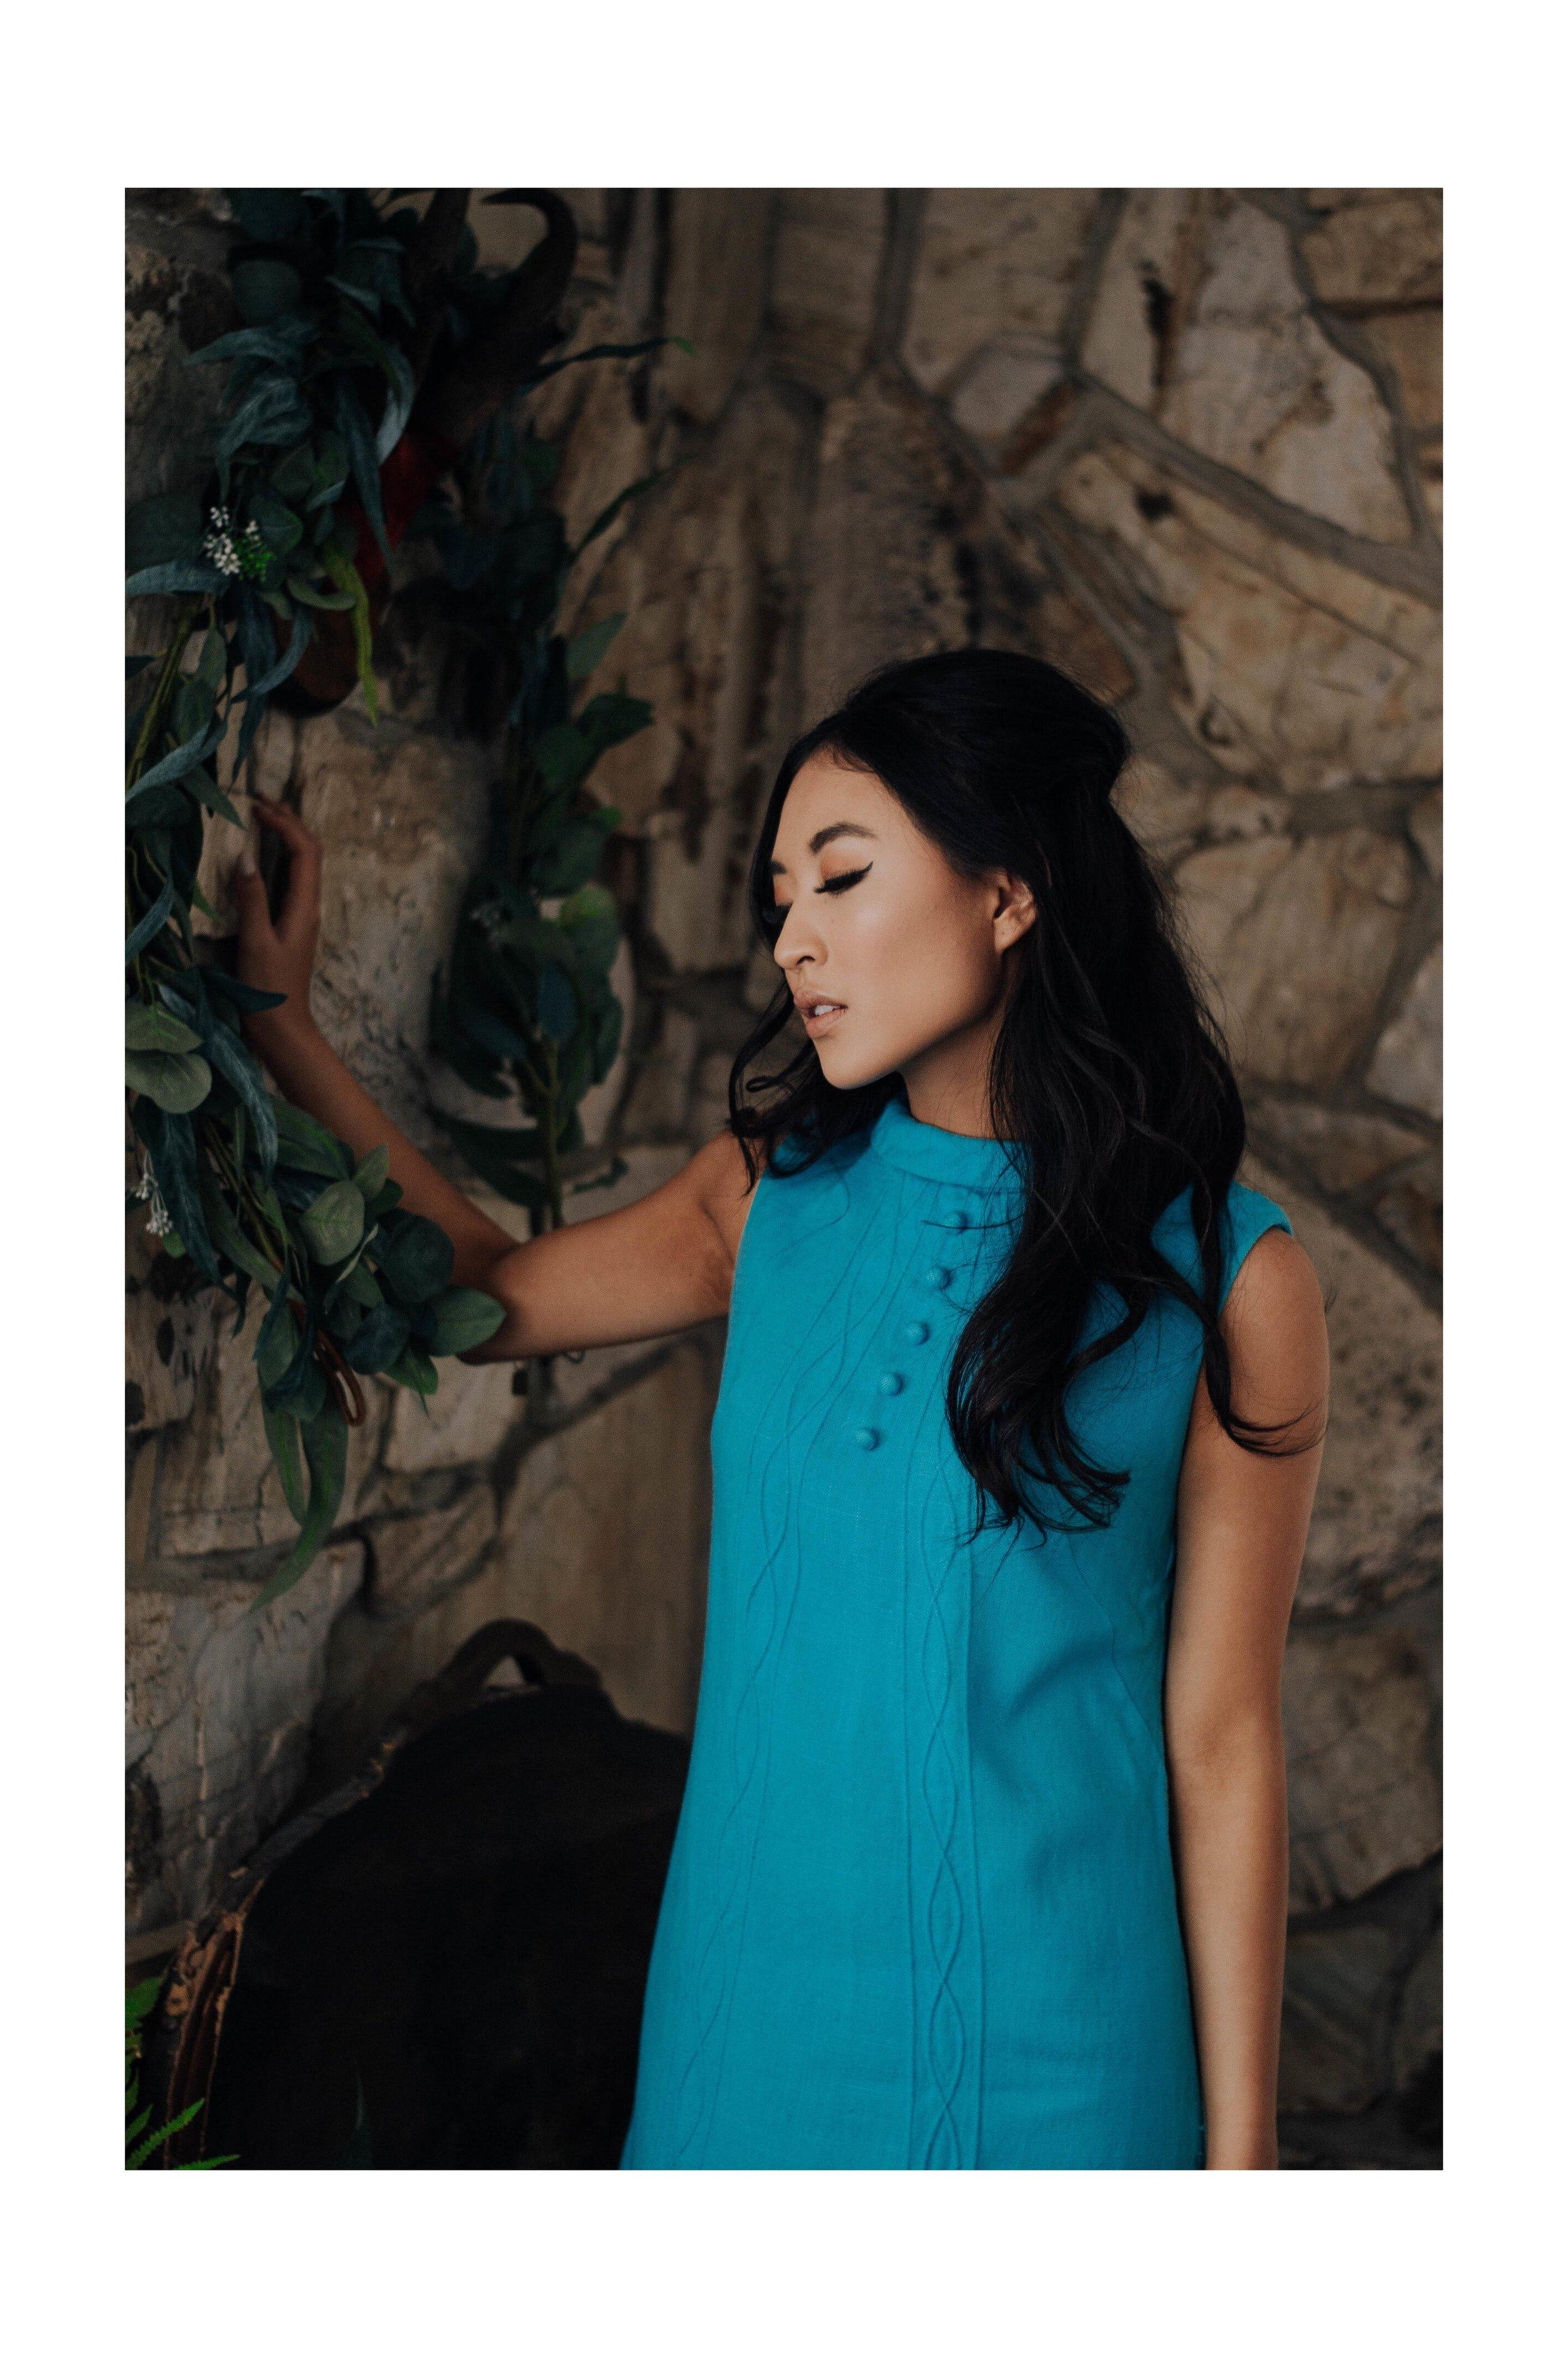 Maeberry Vintage  Photography: Mckenzie Lockwood  Model: Jiajing Yi  Hair & Makeup: Abigail Hill